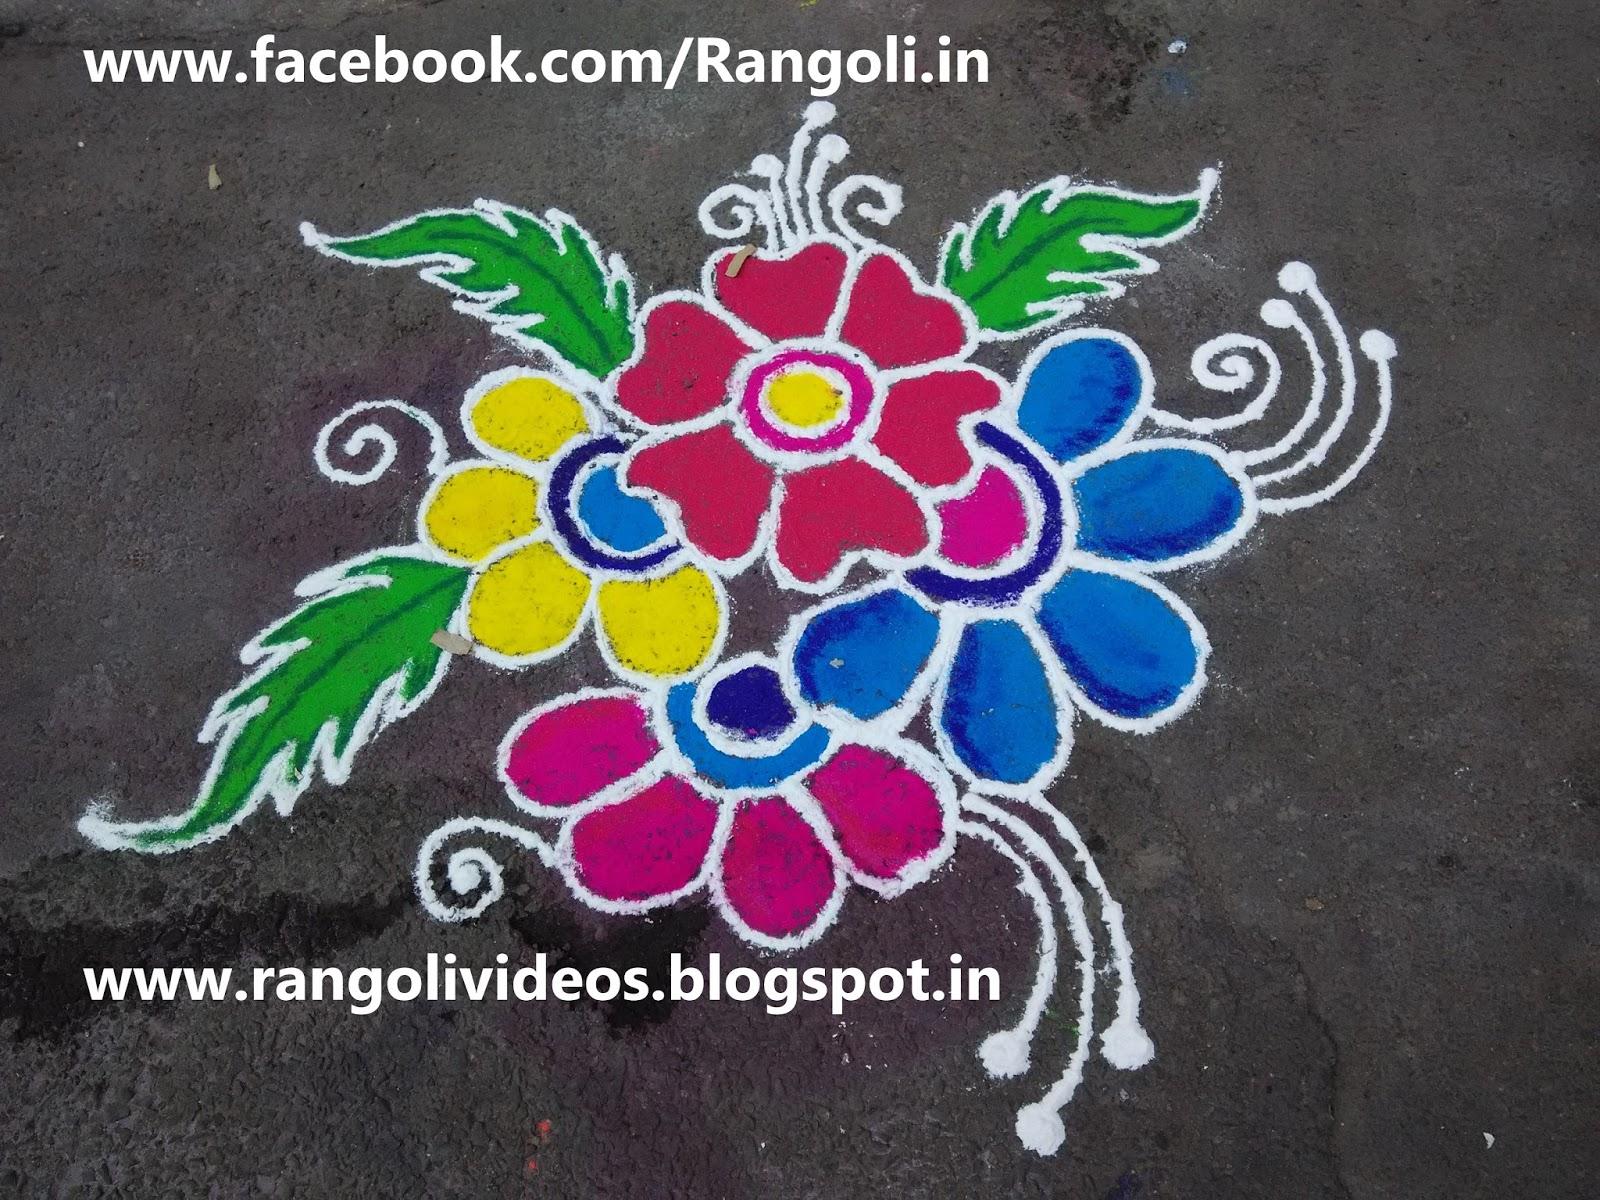 Diwali rangoli kolam designs images margazhi rangoli for Home rangoli designs